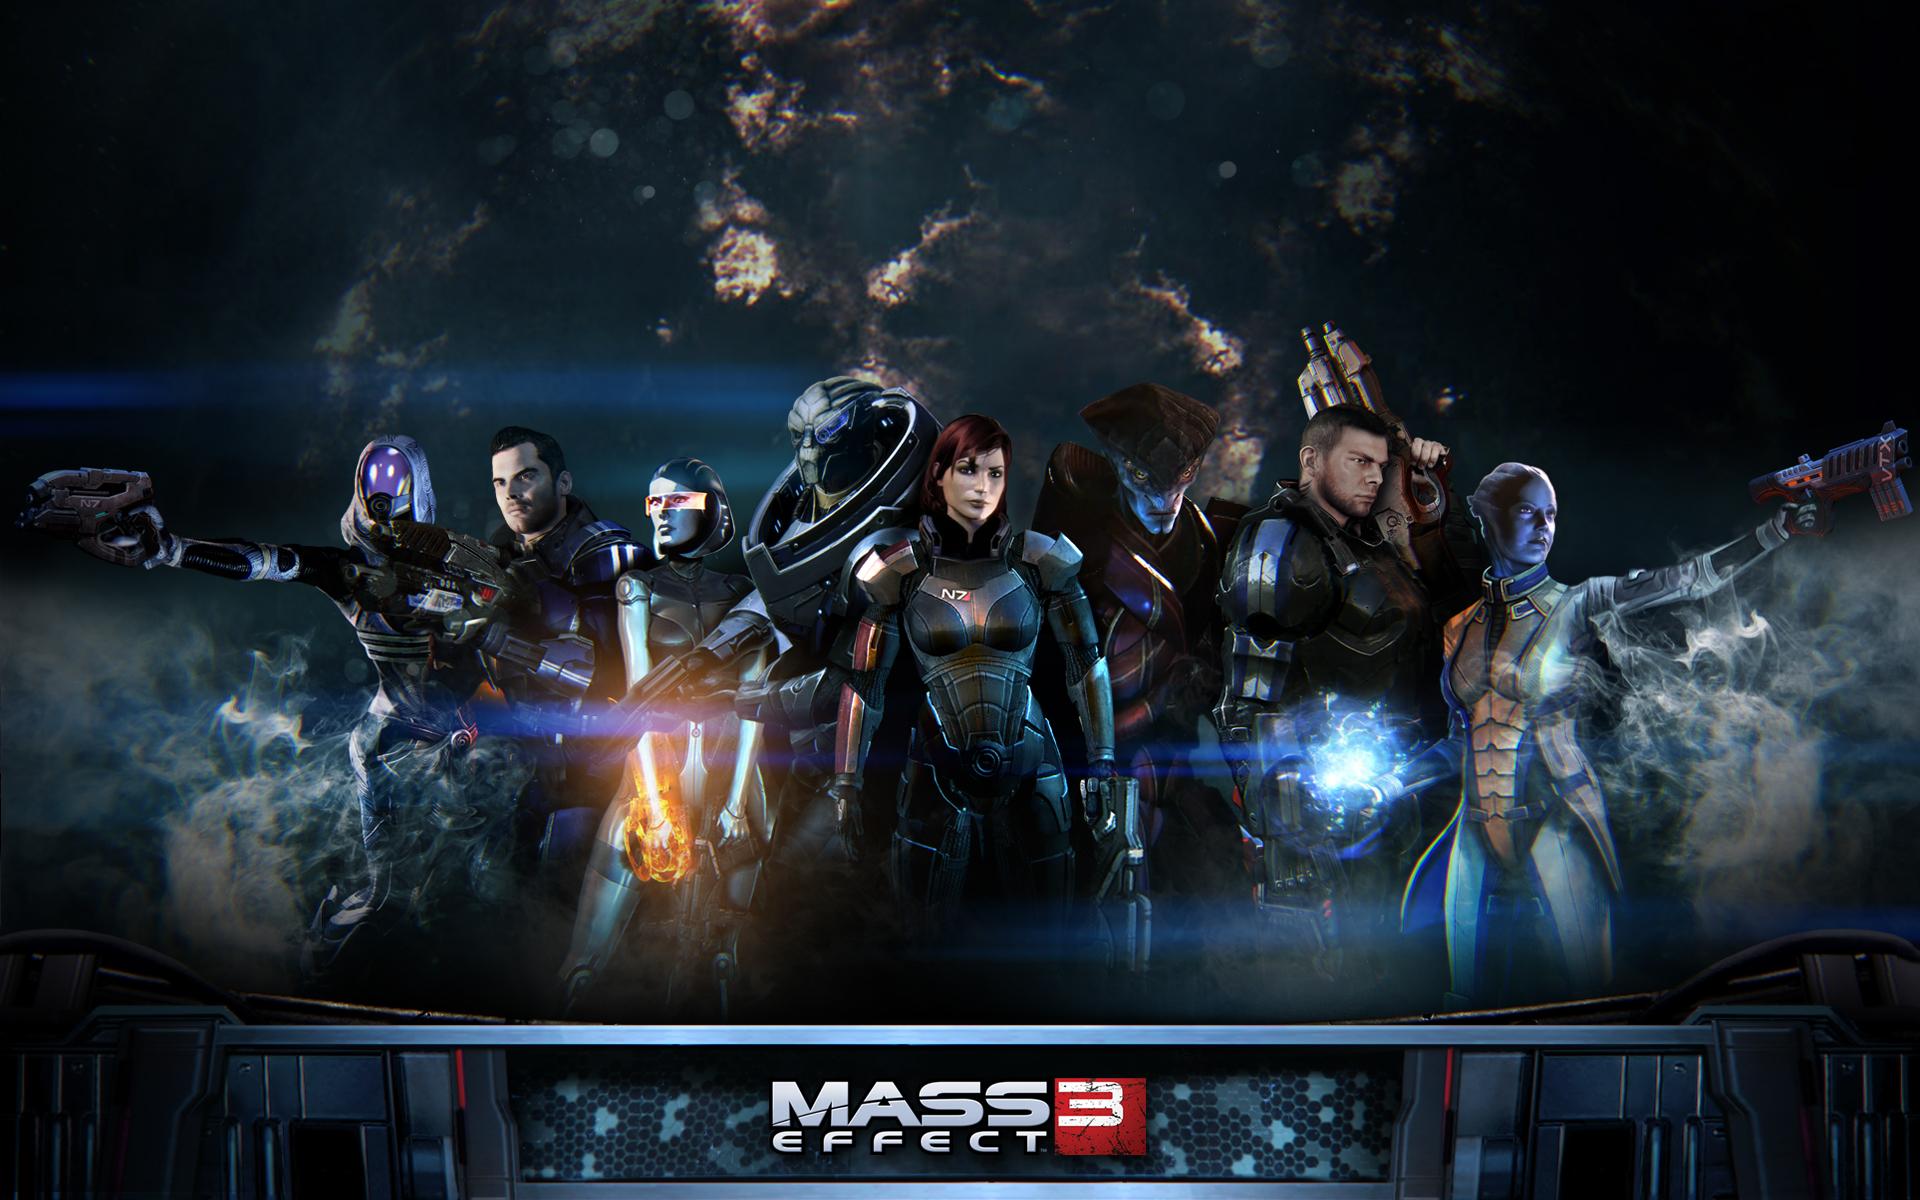 50 Mass Effect 3 Femshep Wallpaper On Wallpapersafari